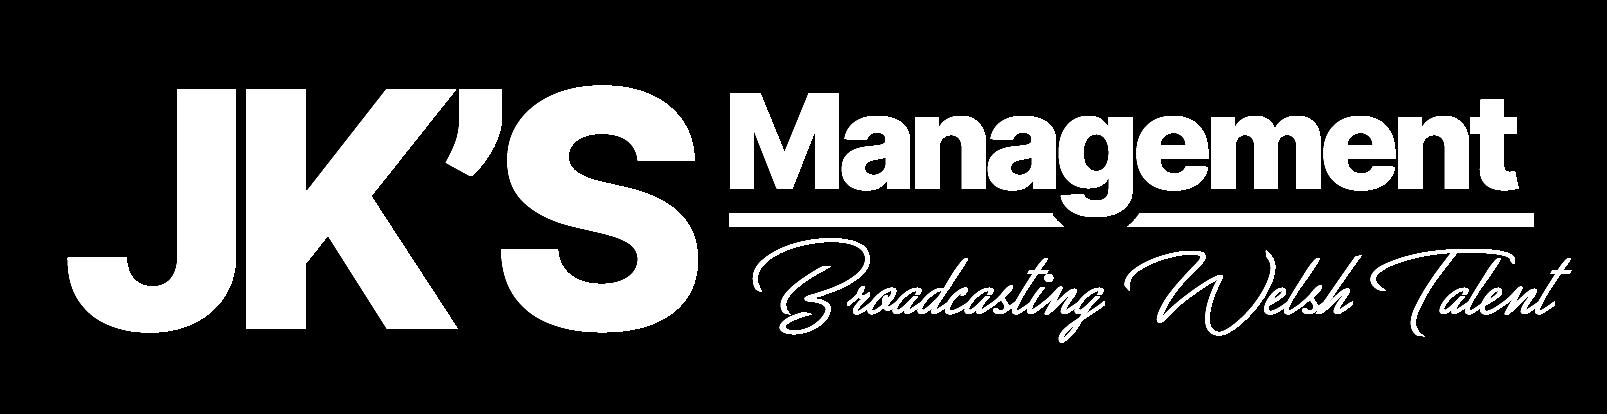 JK's Management